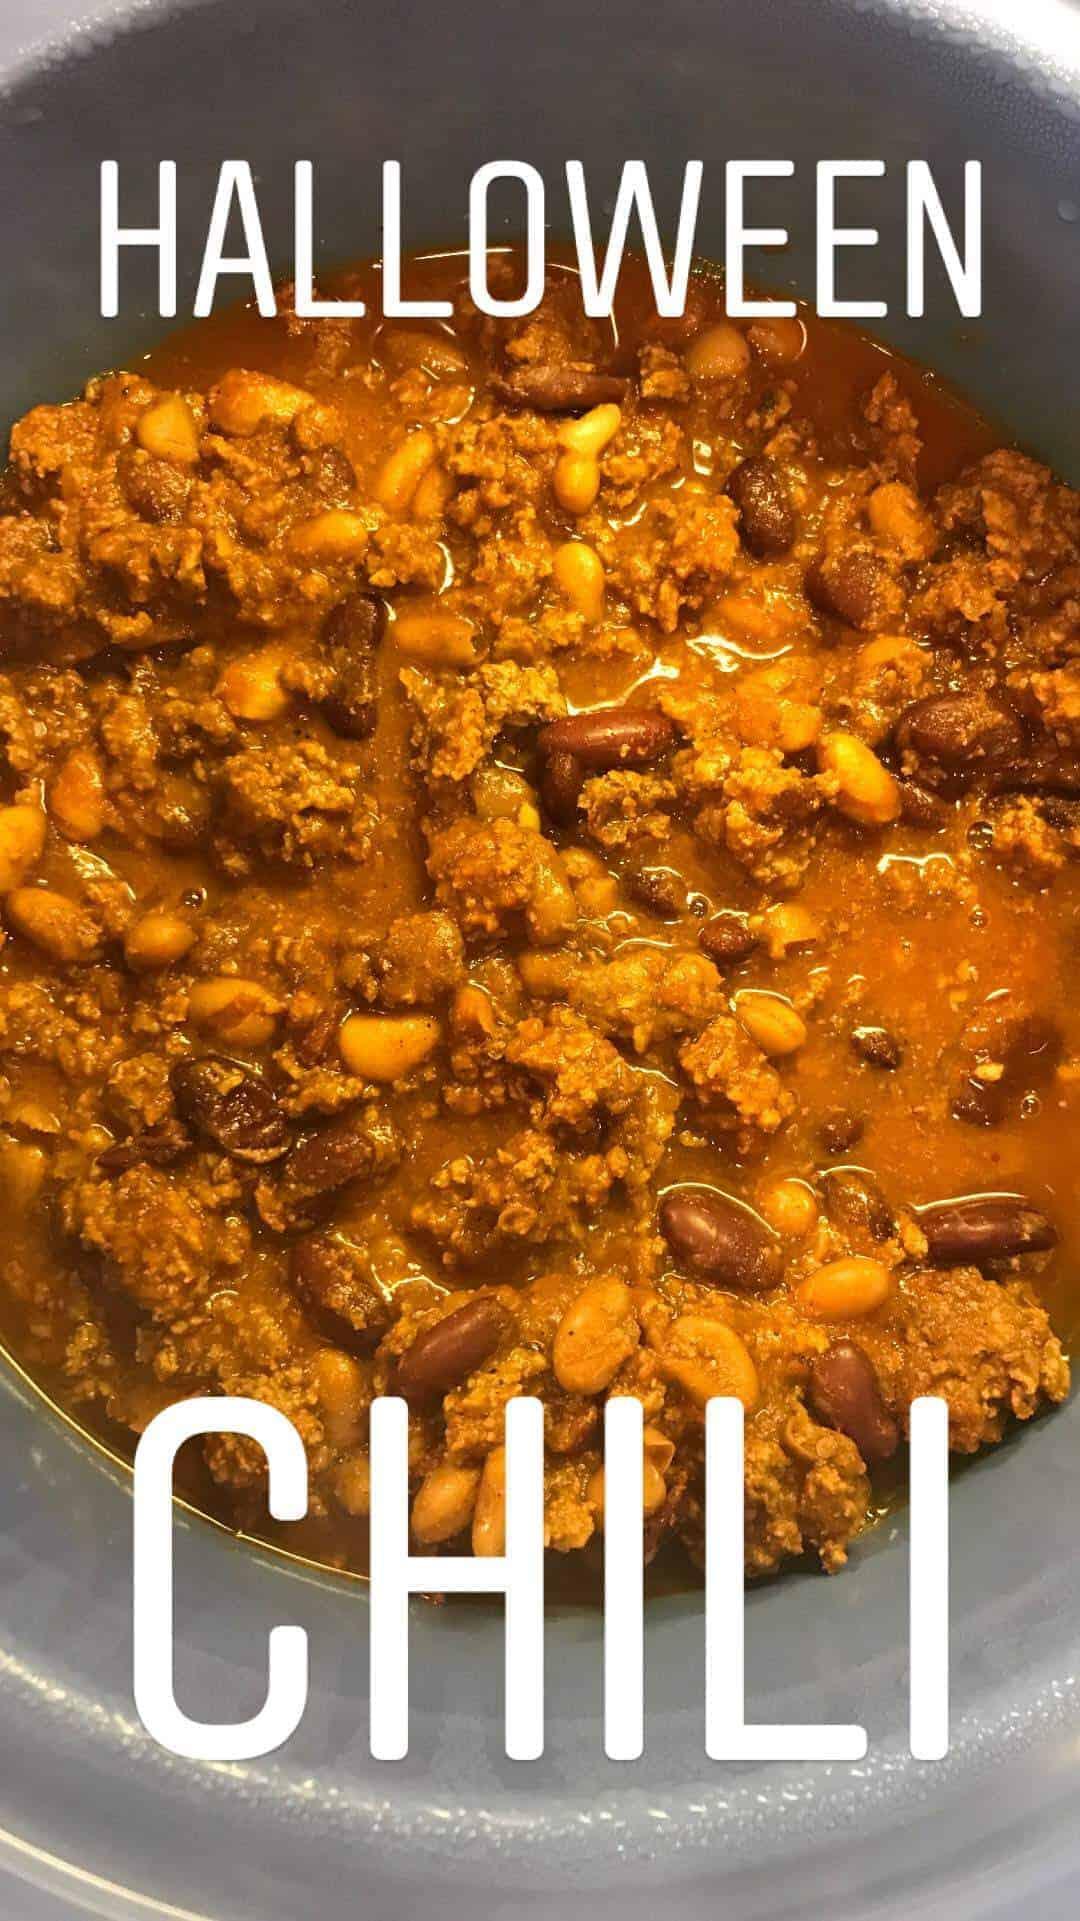 pioneer woman's chili